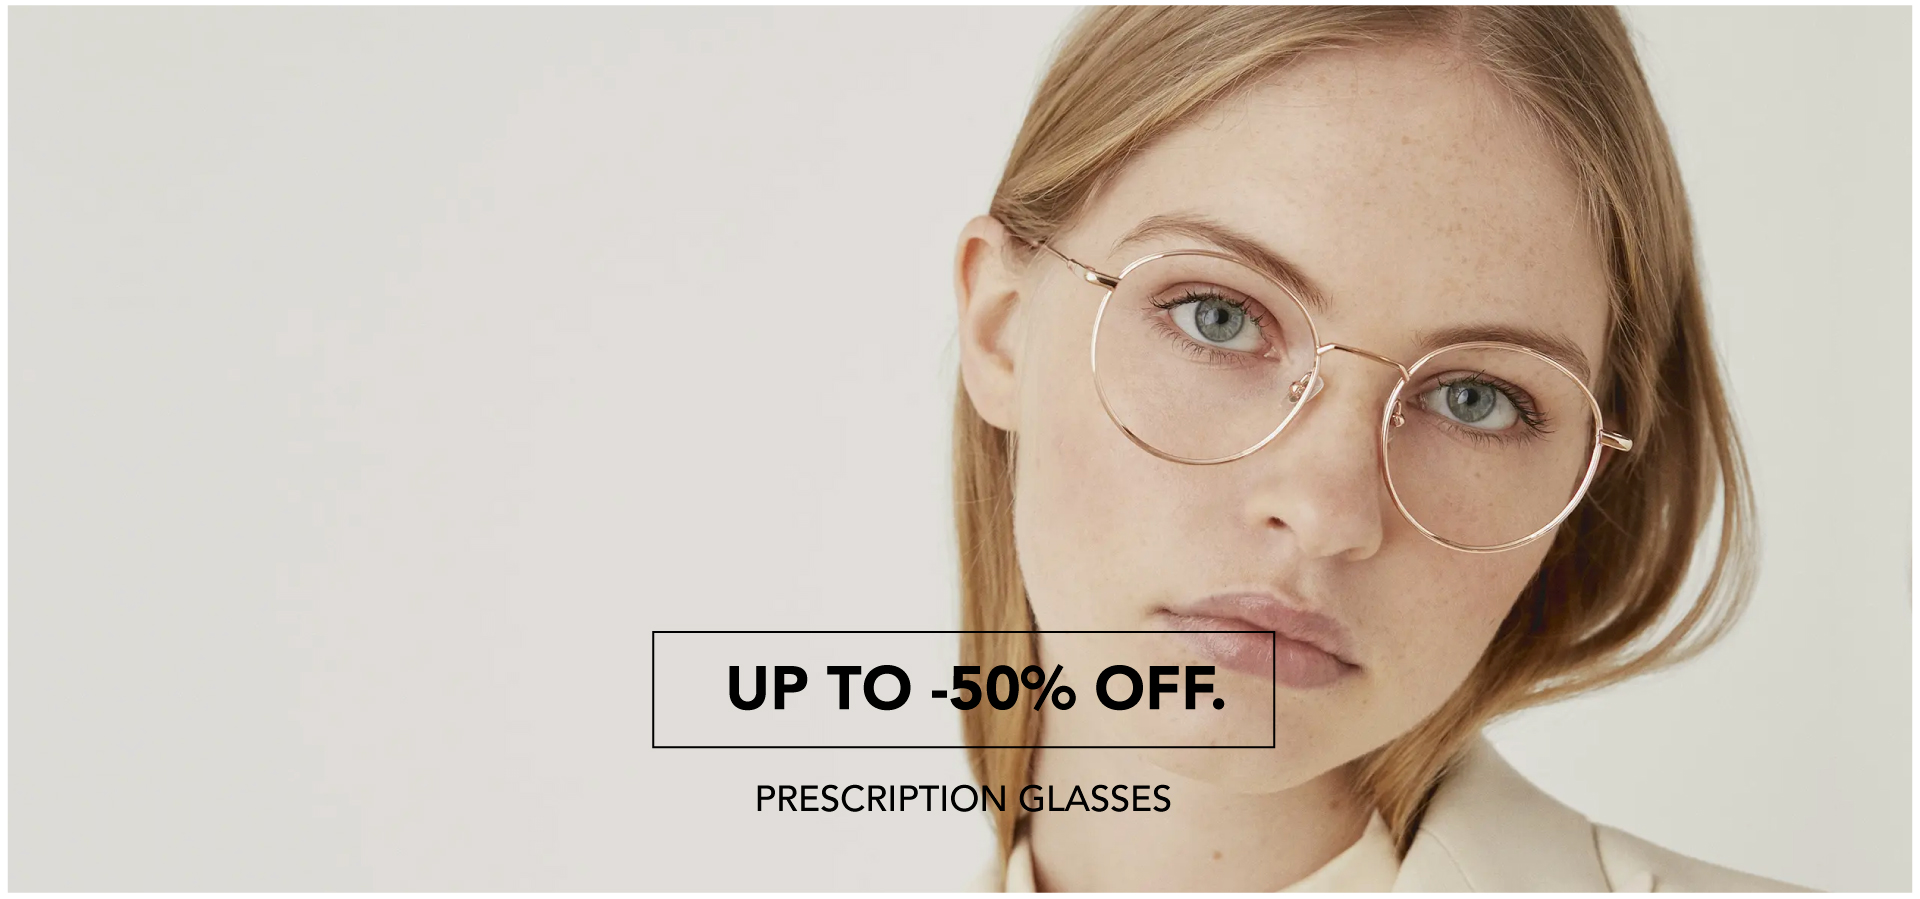 PRESCRIPTION GLASSES | UP TO 50% OFF